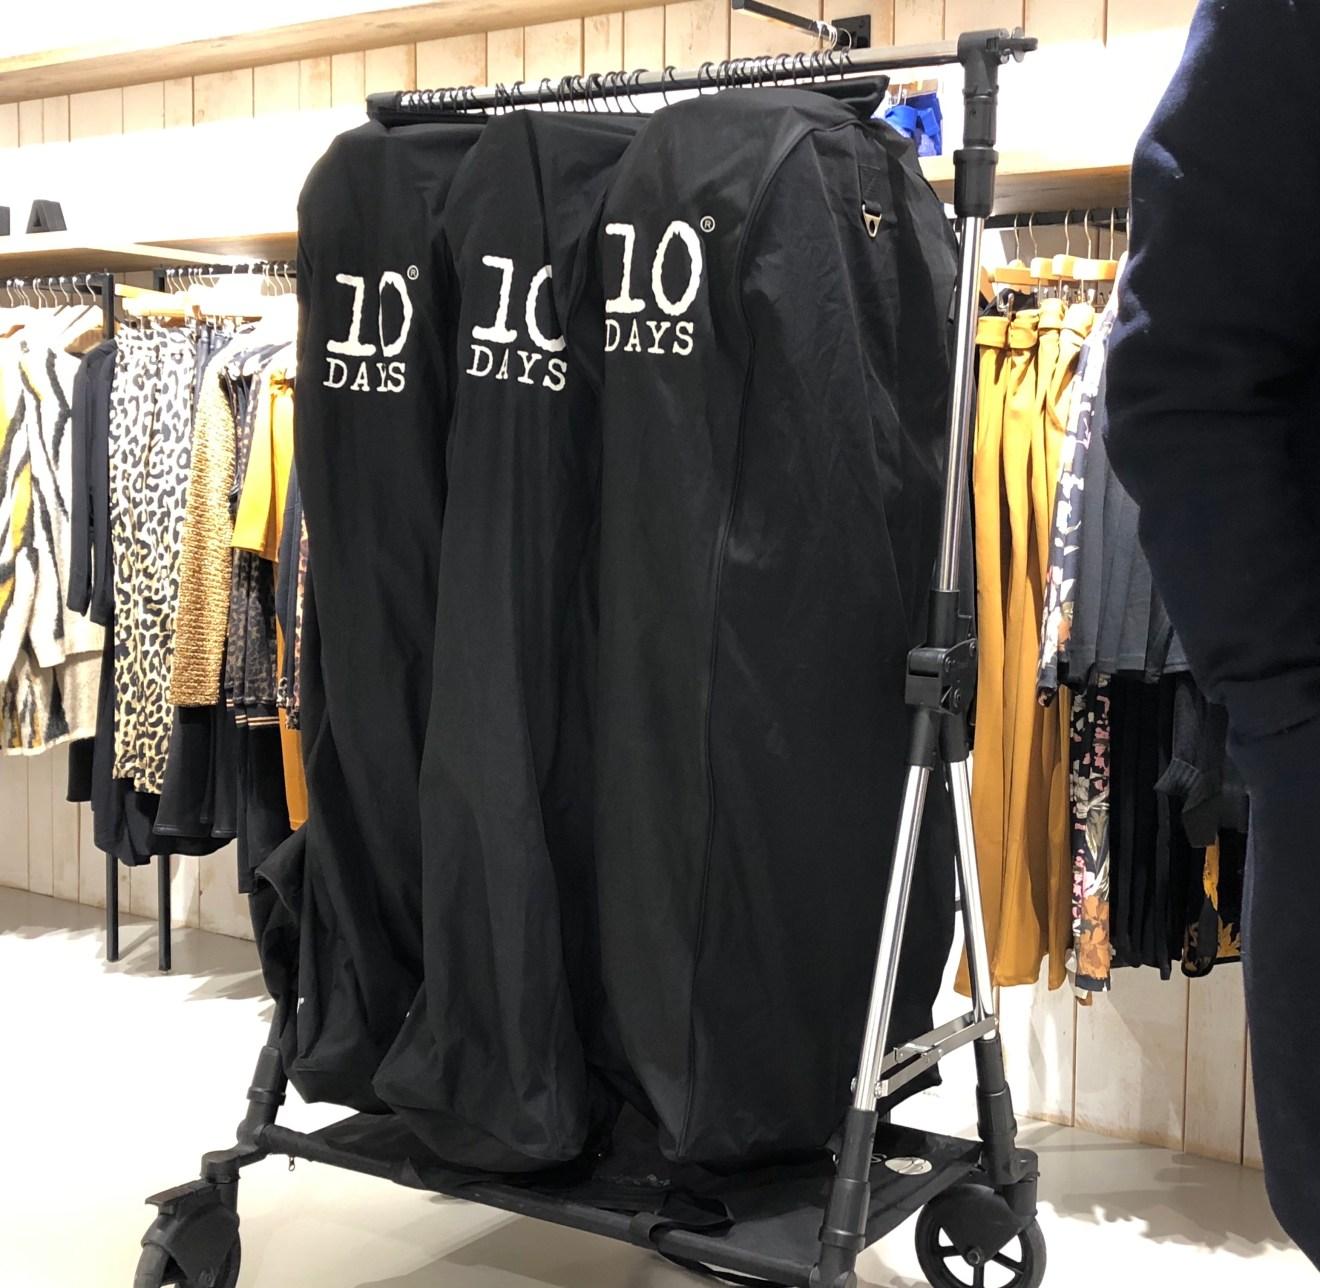 kledinghoezen 10 days